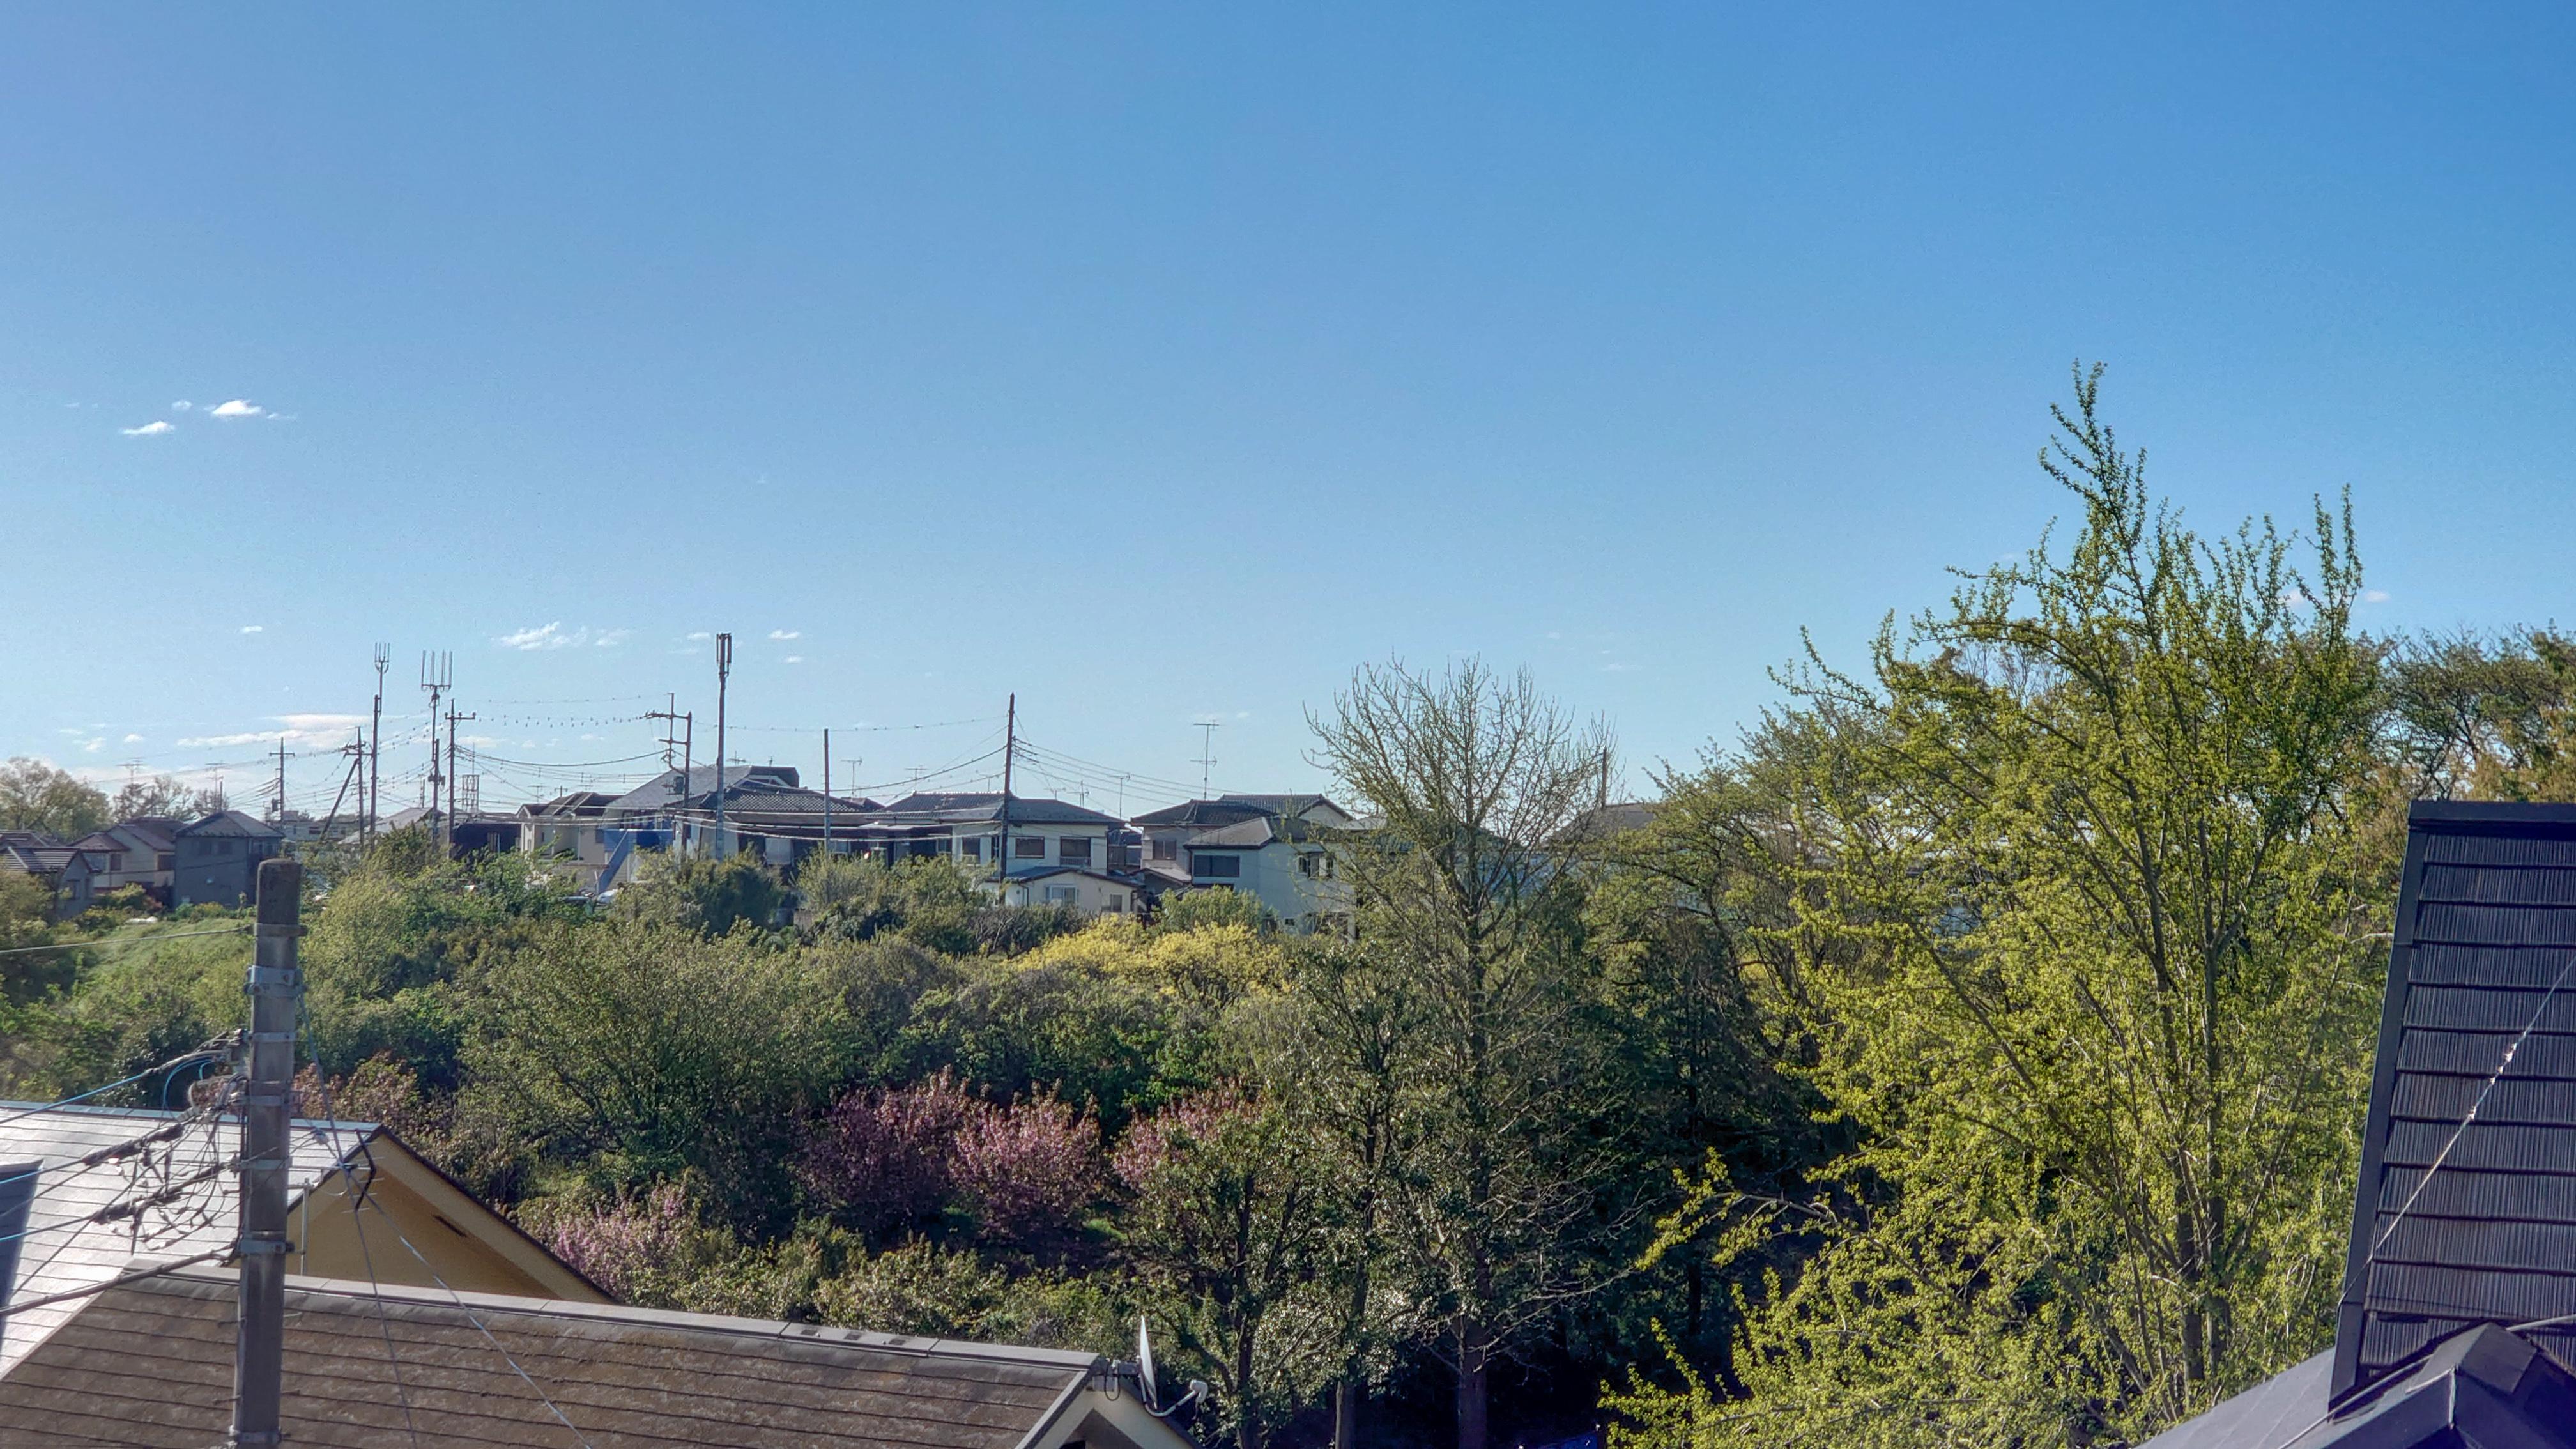 Один день домохозяйки в недоизоляции, Япония, фото 3